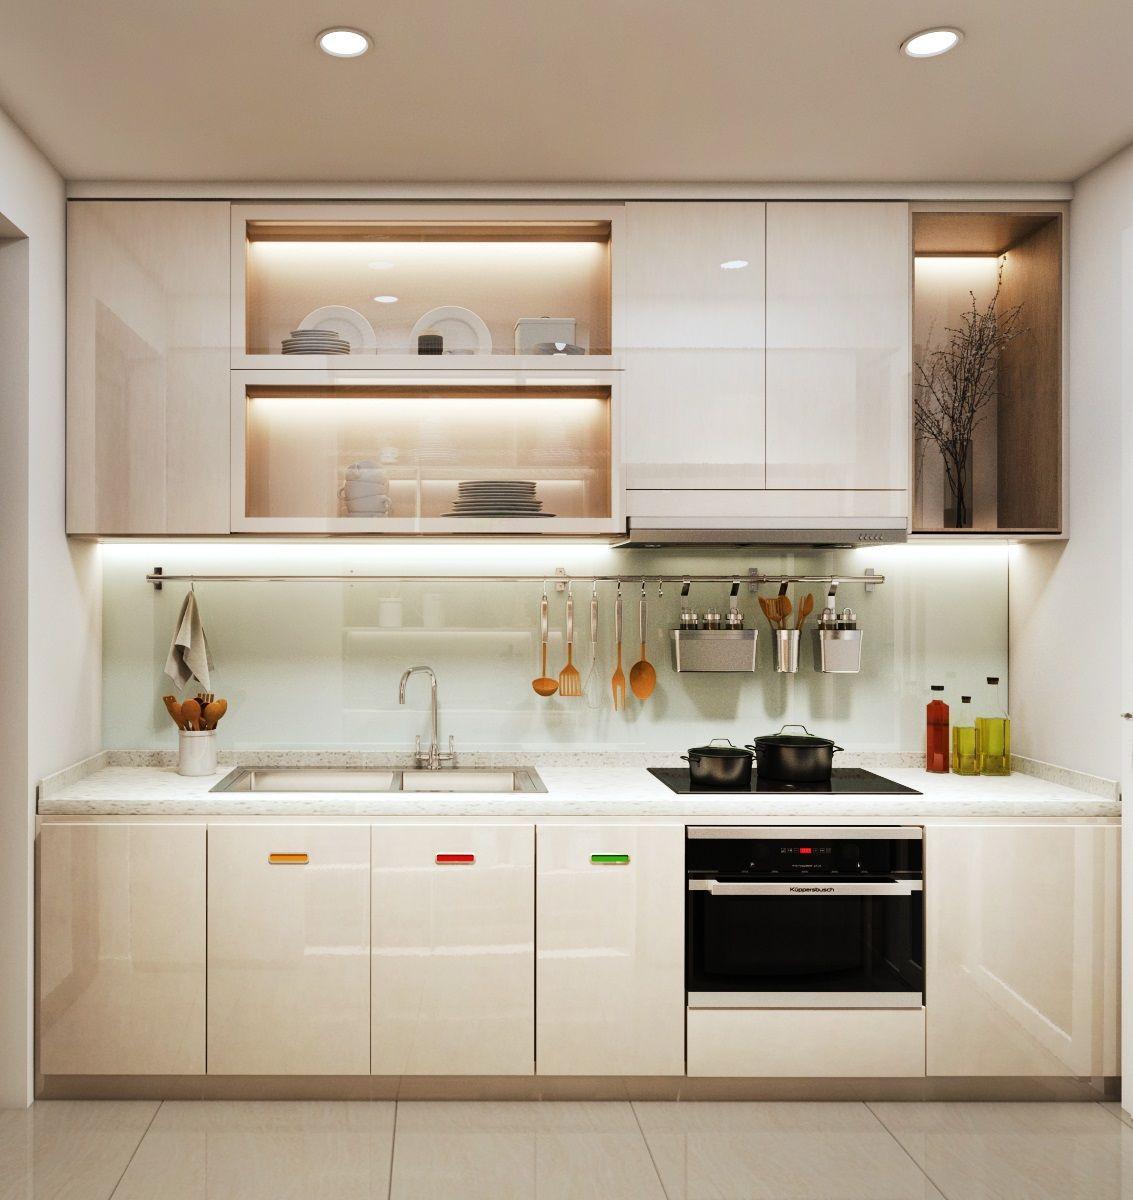 2br Kitchen V1